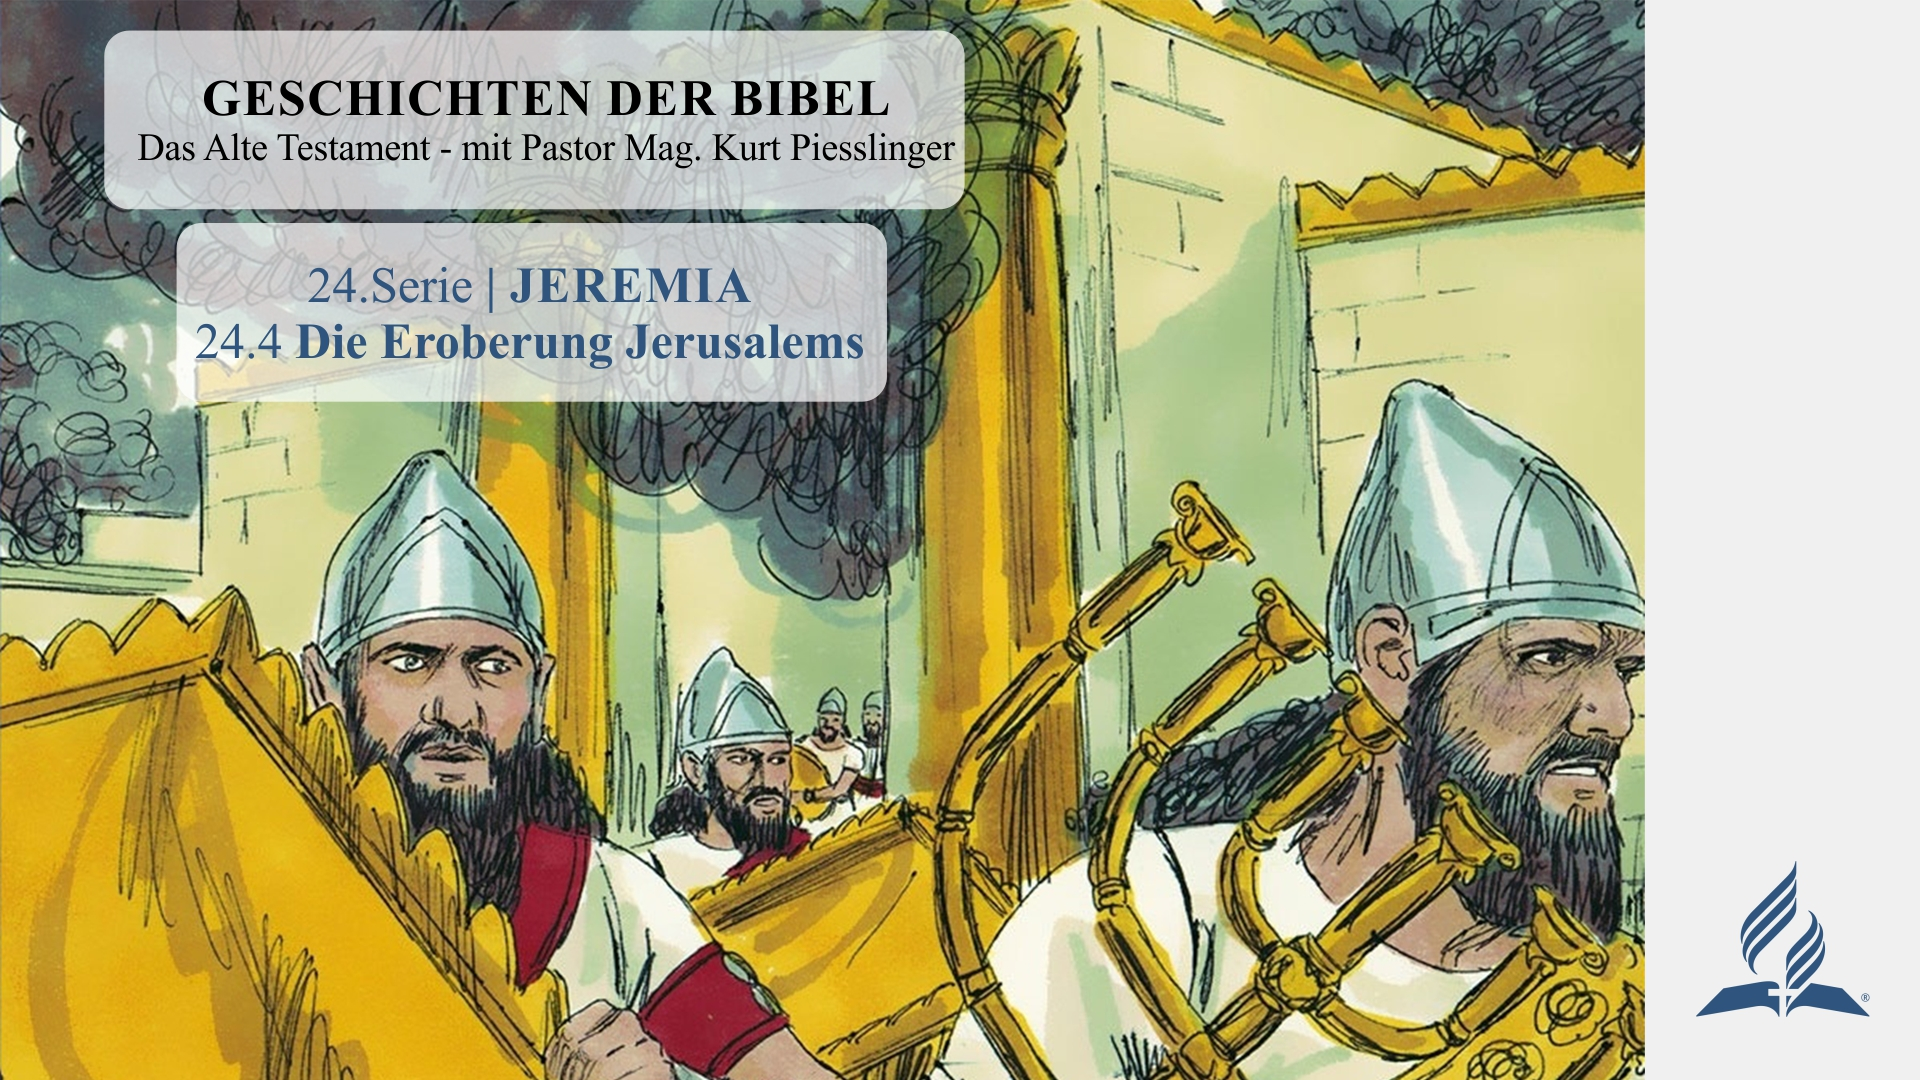 GESCHICHTEN DER BIBEL : 24.4 Die Eroberung Jerusalems – 24.JEREMIA | Pastor Mag. Kurt Piesslinger